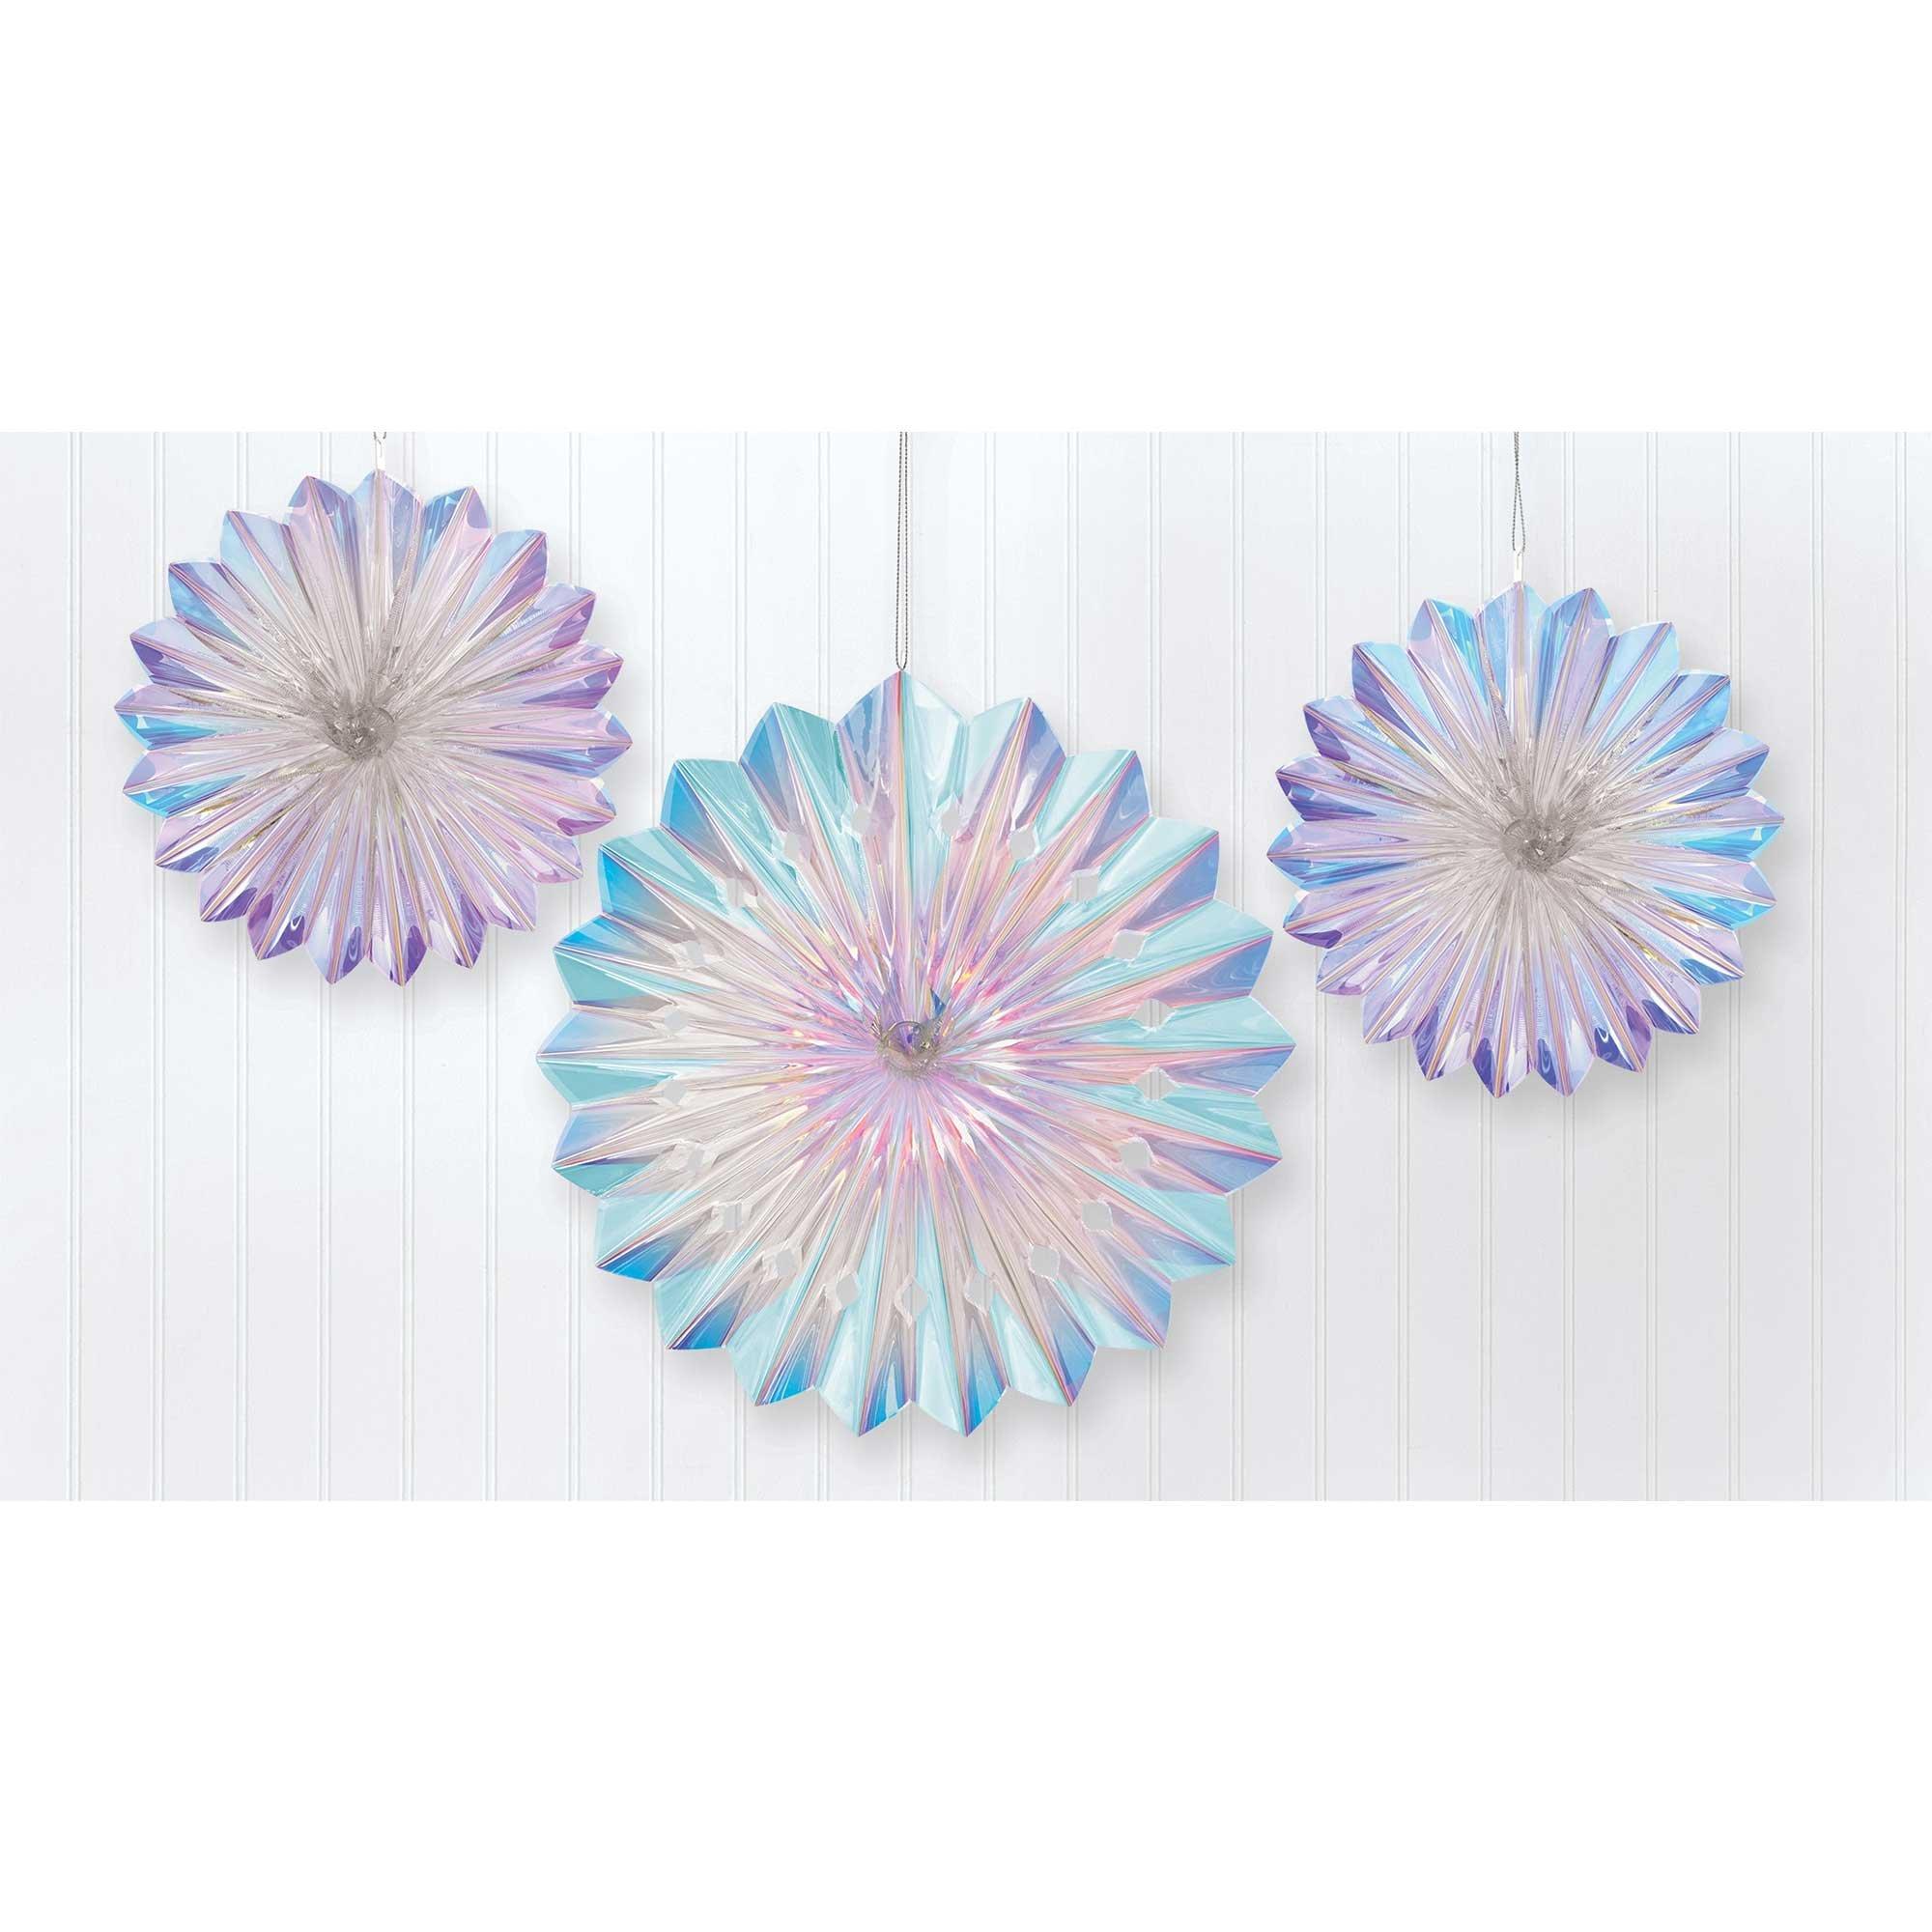 Luminous Birthday Iridescent Foil Fan Decorations